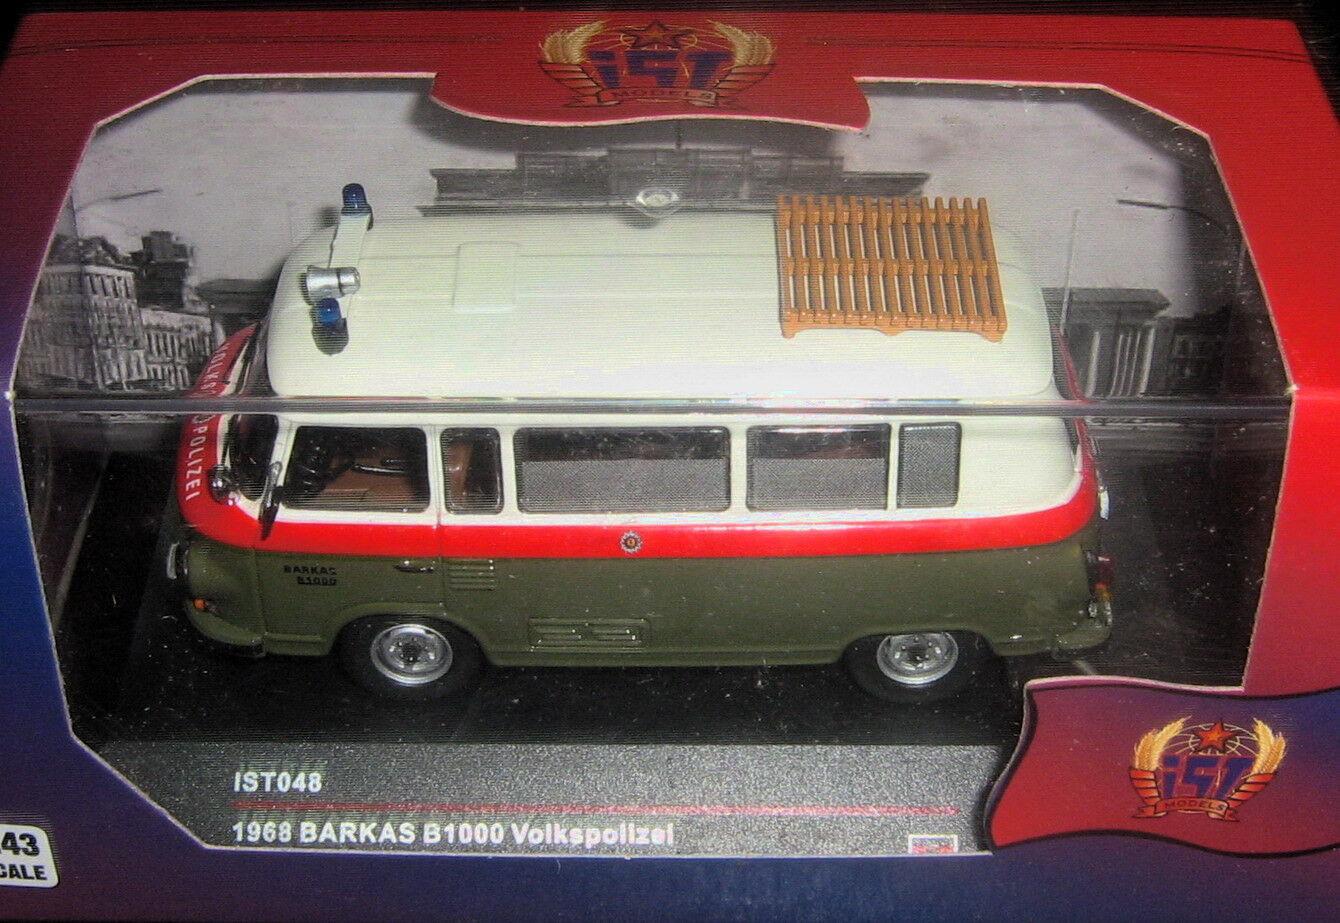 1 1 1 43 1968 Barkas B1000 Volkspolizei (Police bus) IXO IST 048 70ee75